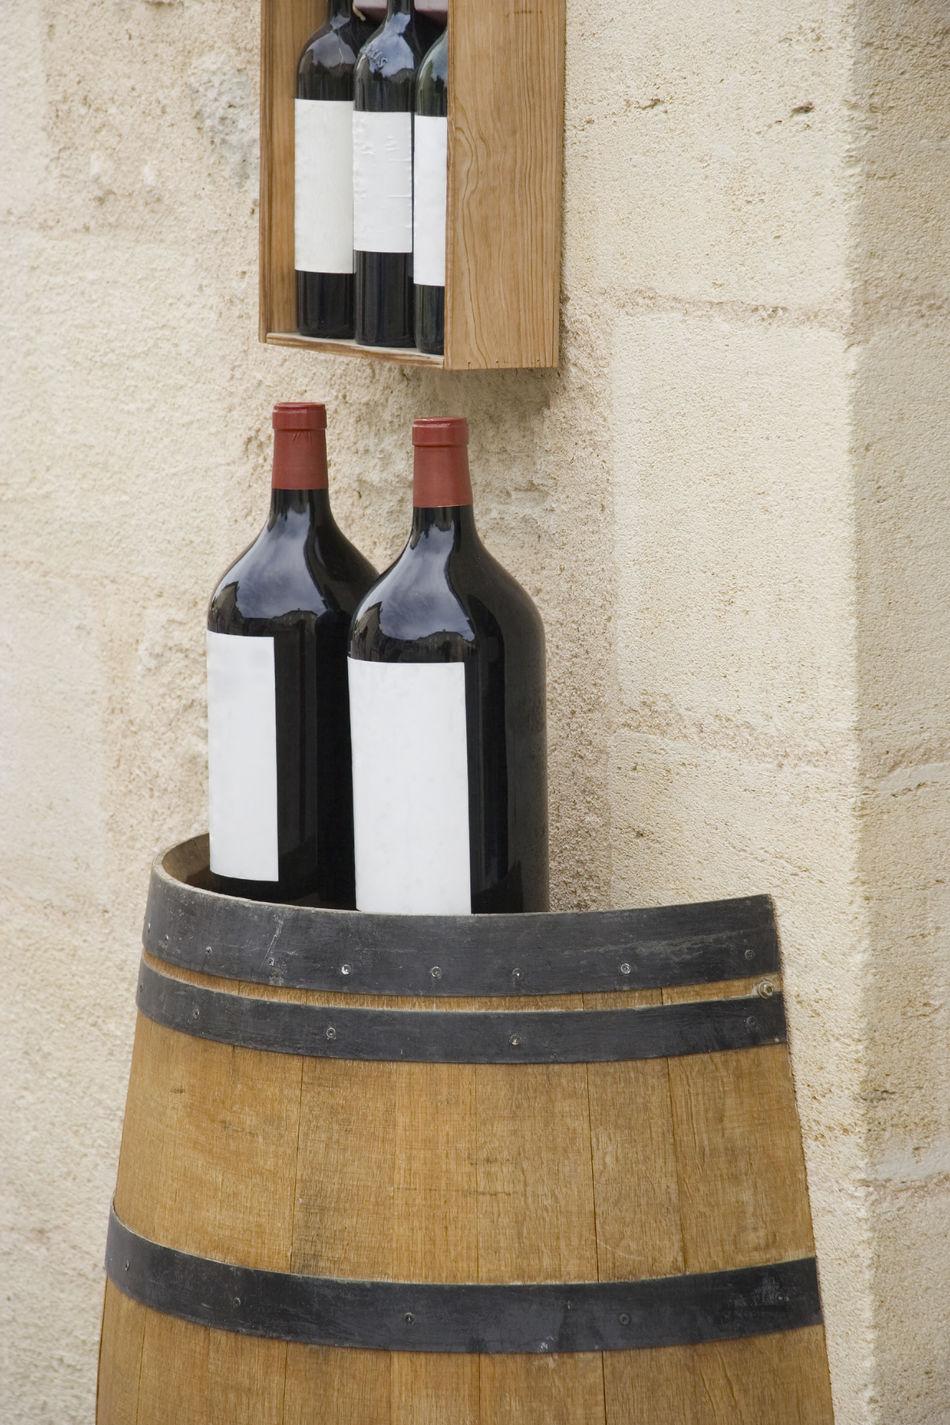 3 l wine bottles on a wine cask - saint-emilion, france Alcohol BIG Blank Label Bordeaux Château Drink For Sale France Grand Cru Merlot No People Outdoors Rack Red Wine Retail  Saint-Emilion Store Storefront Wine Wine Barrels Wine Bottle Wine Bottles Wine Moments Winemaking Winery